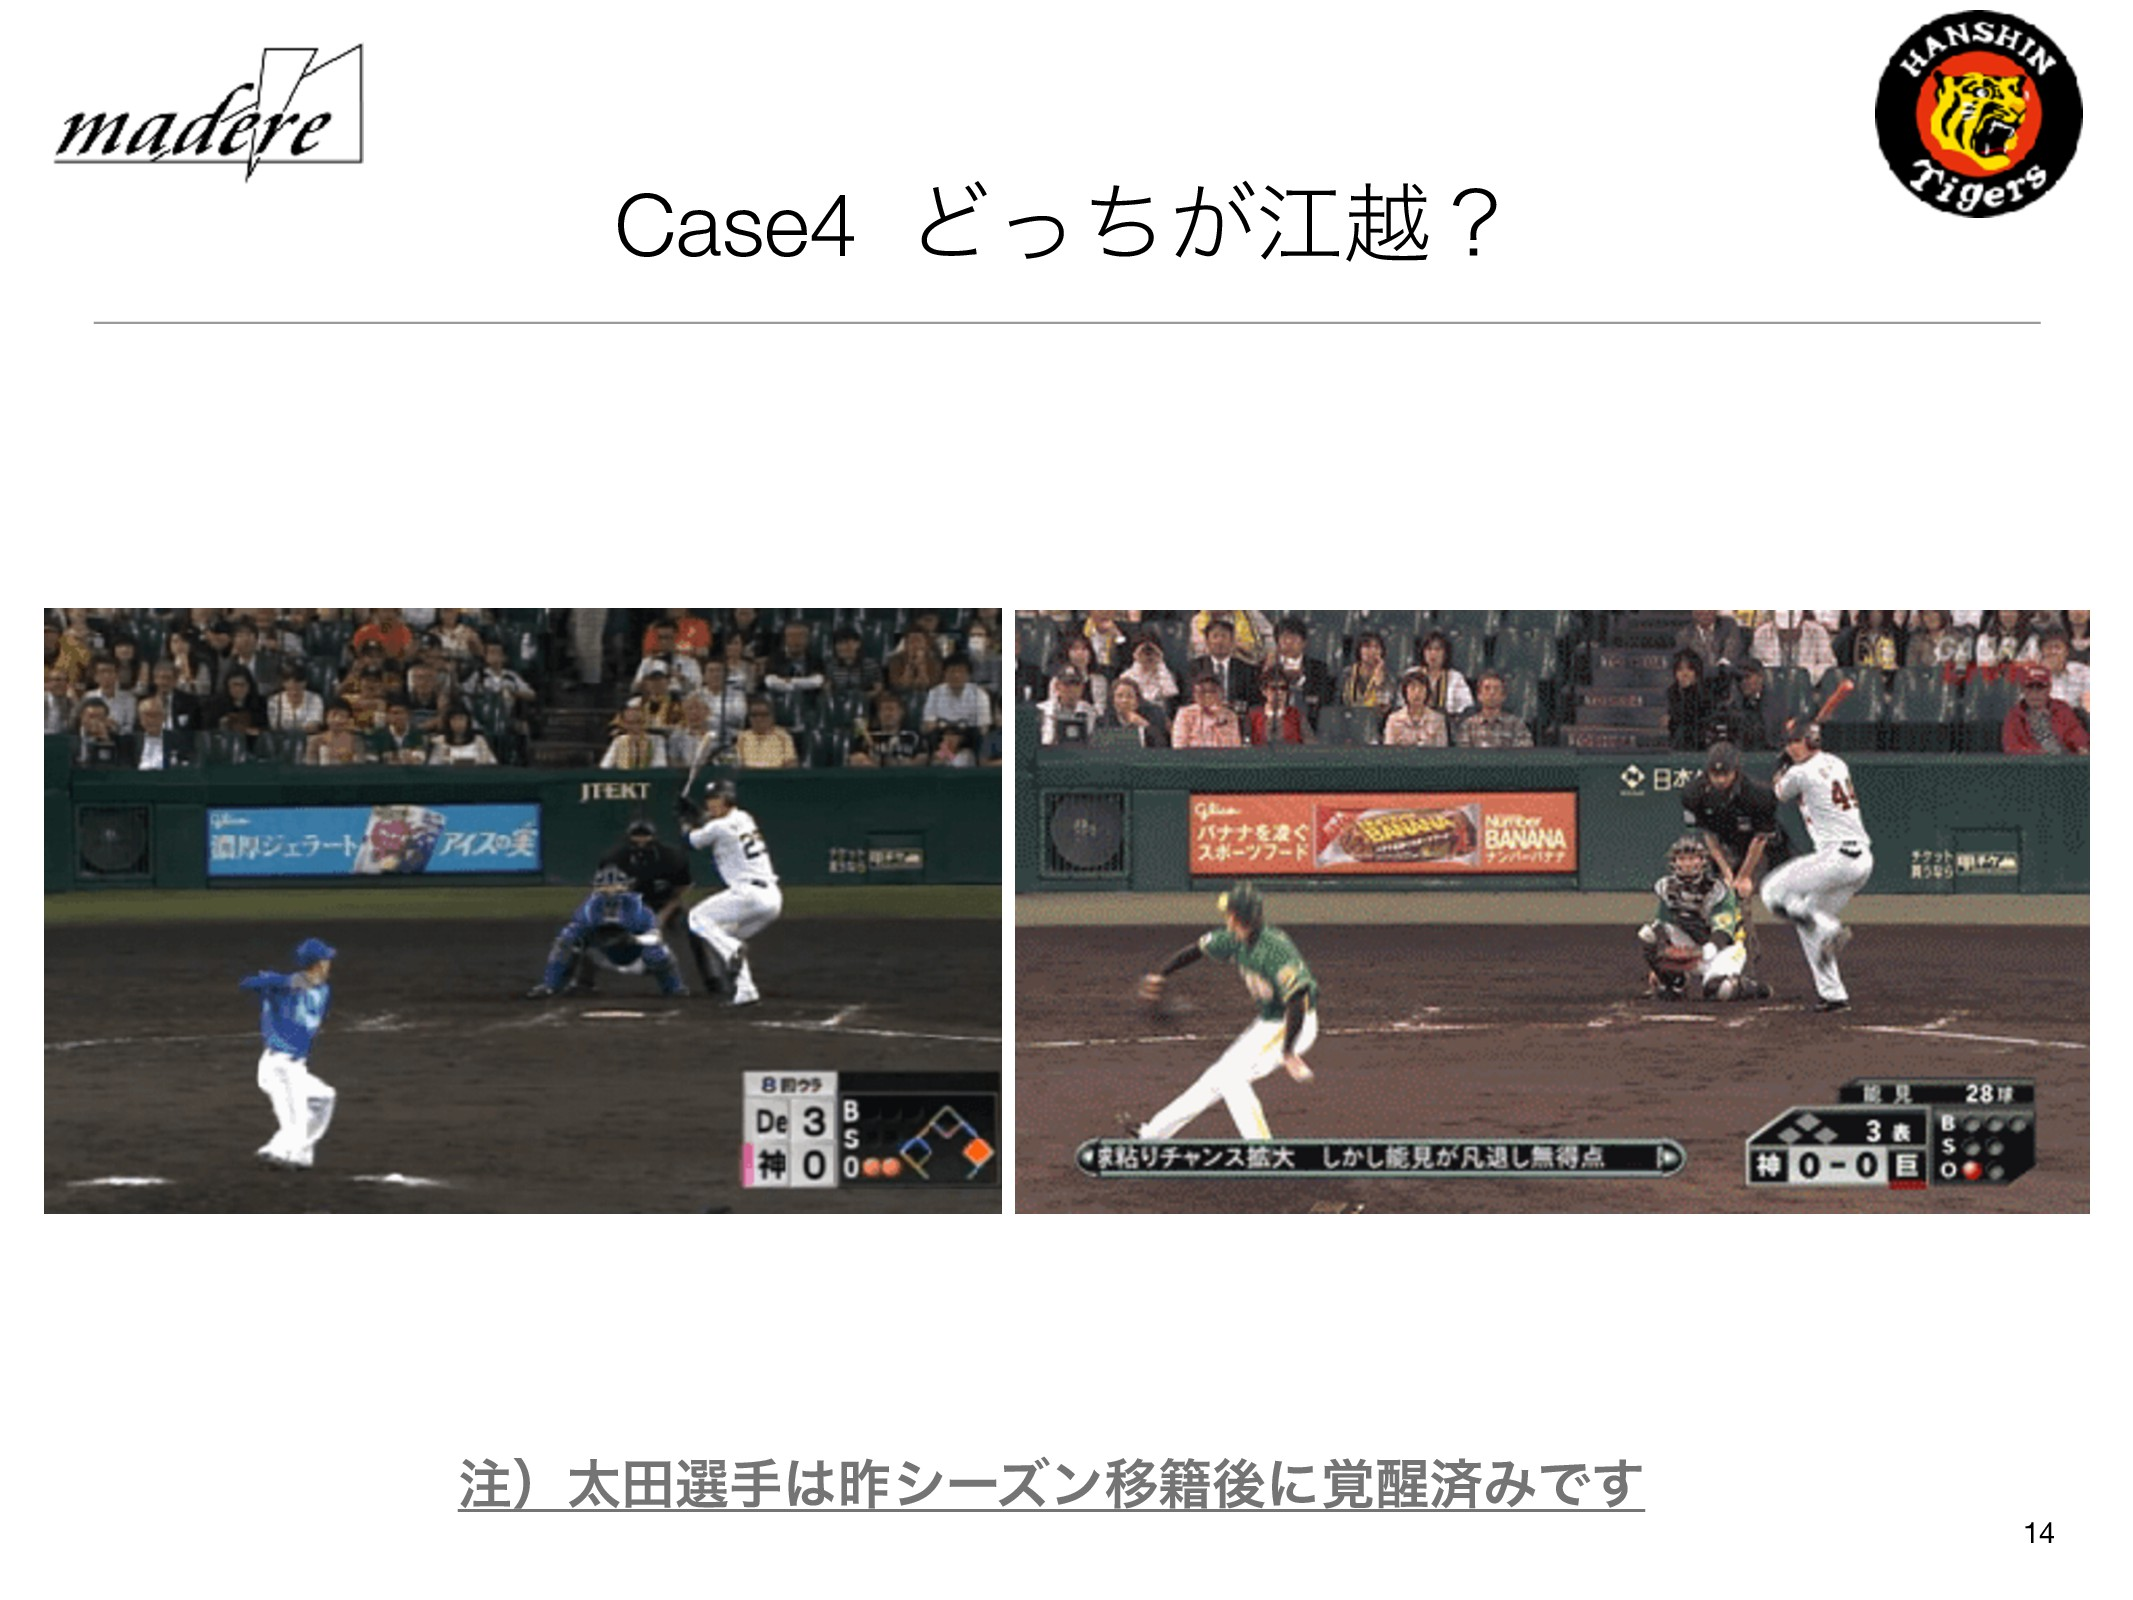 Case4 Ͳ͕ͬͪߐӽʁ 14 ʣଠాબखࡢγʔζϯҠ੶ޙʹ֮੧ࡁΈͰ͢